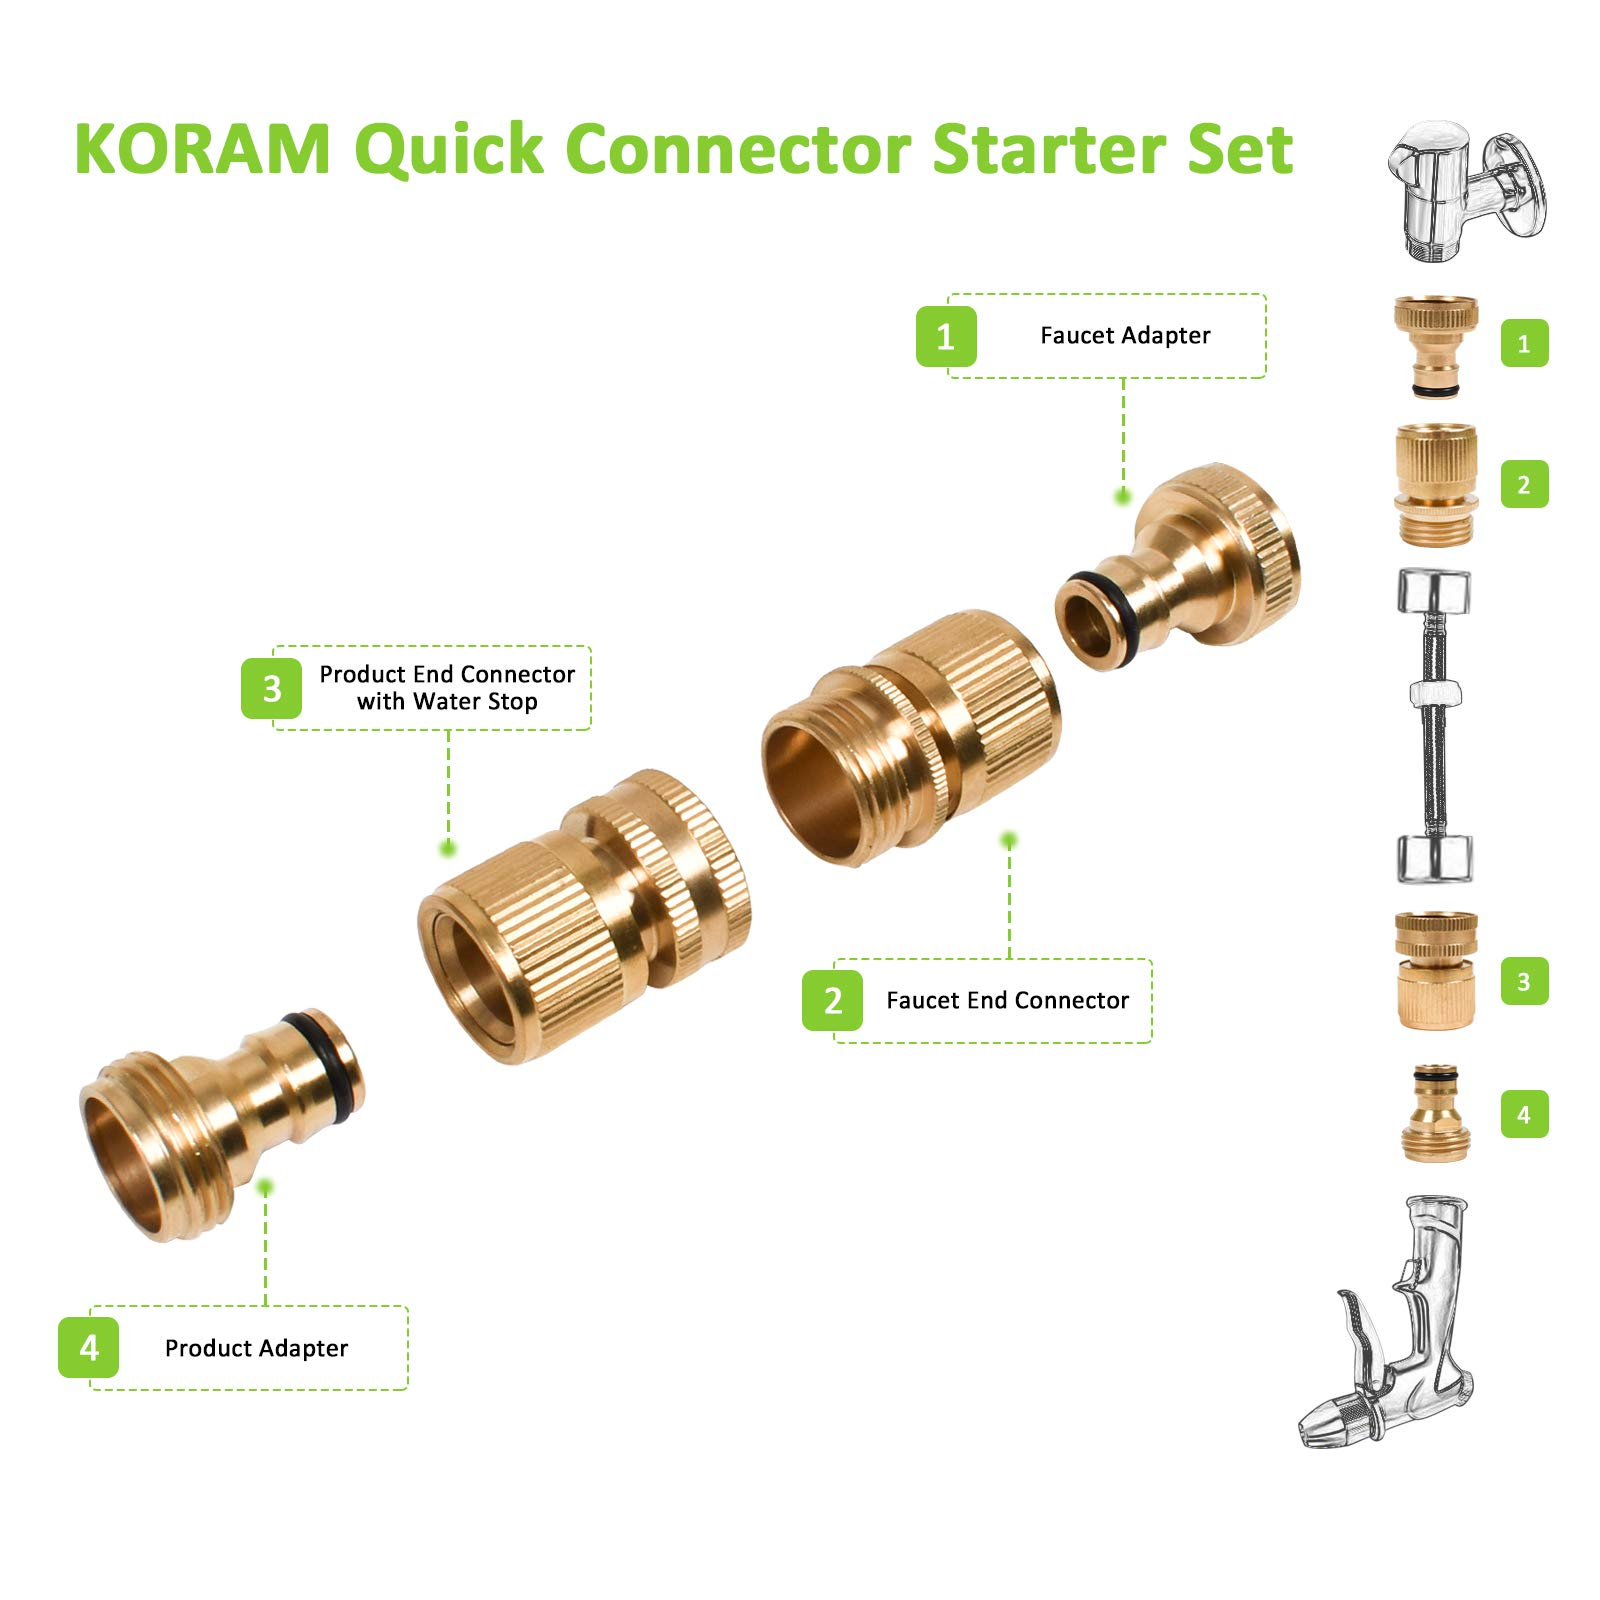 KORAM Garden Hose Quick Connector Starter Set 3/4\